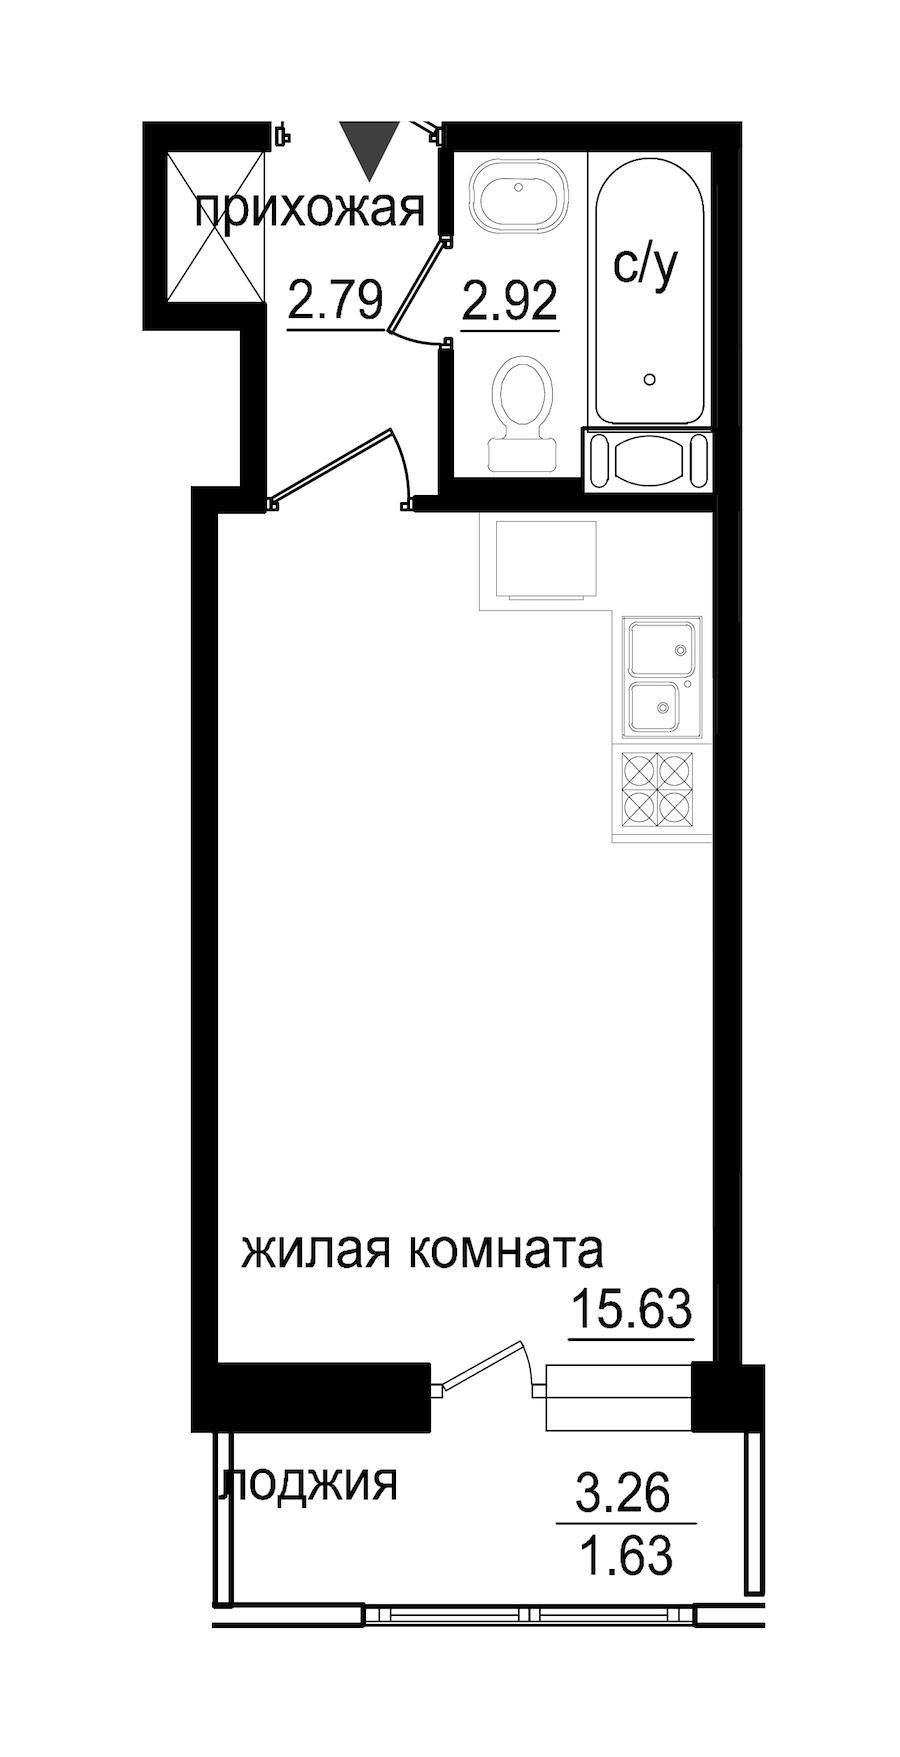 Студия 22 м<sup>2</sup> на 5 этаже